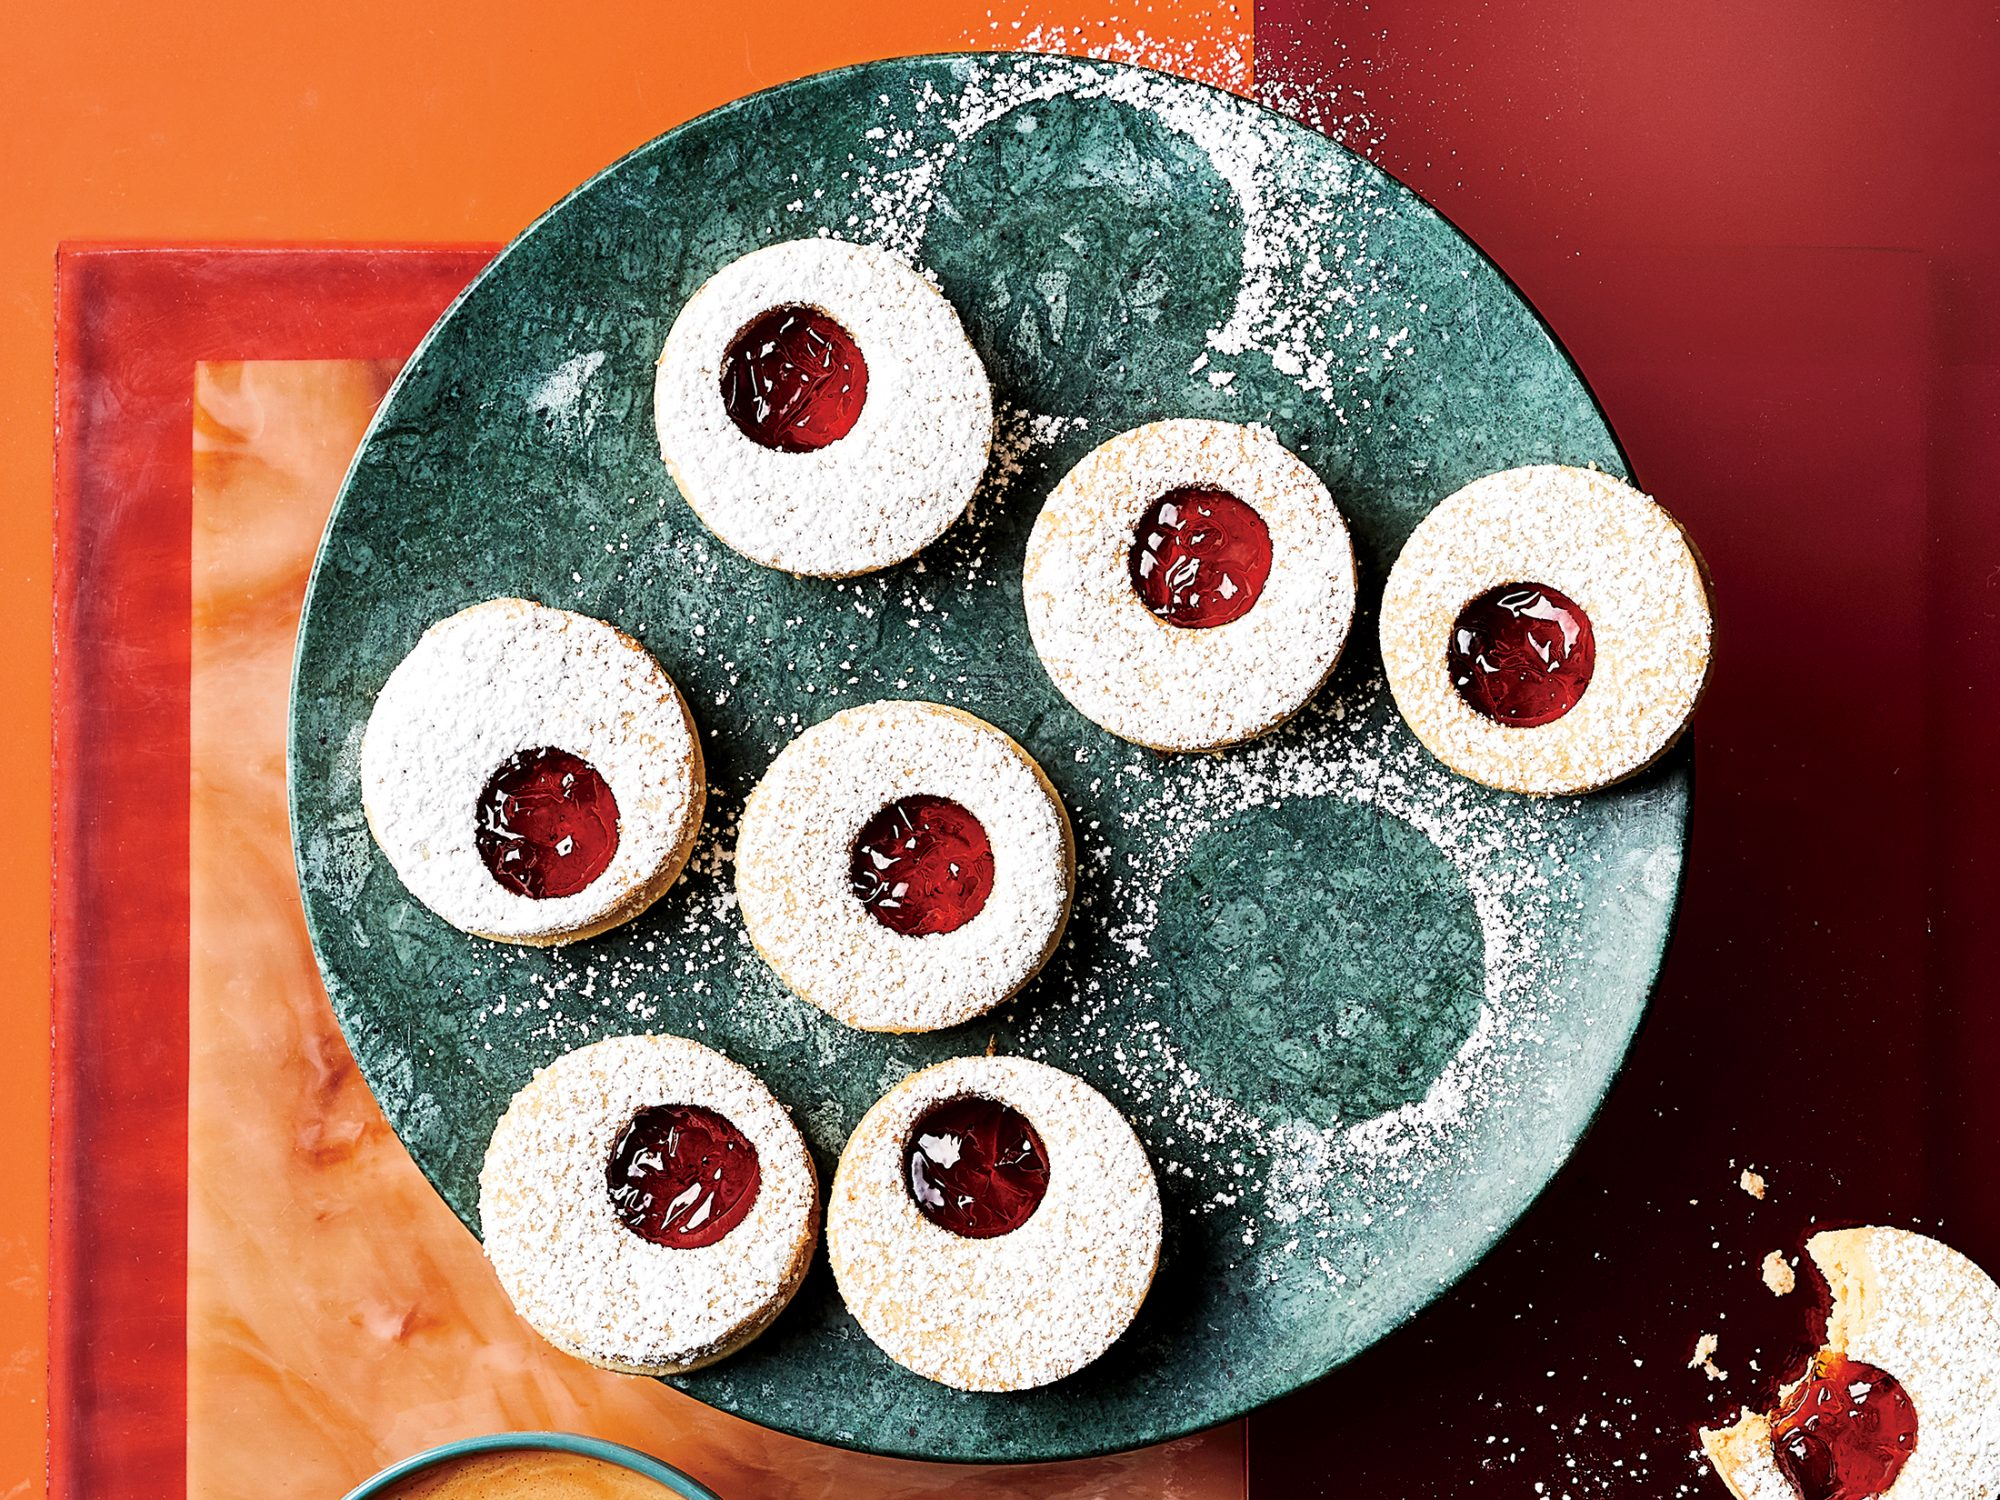 Almond-Currant Linzer Cookies